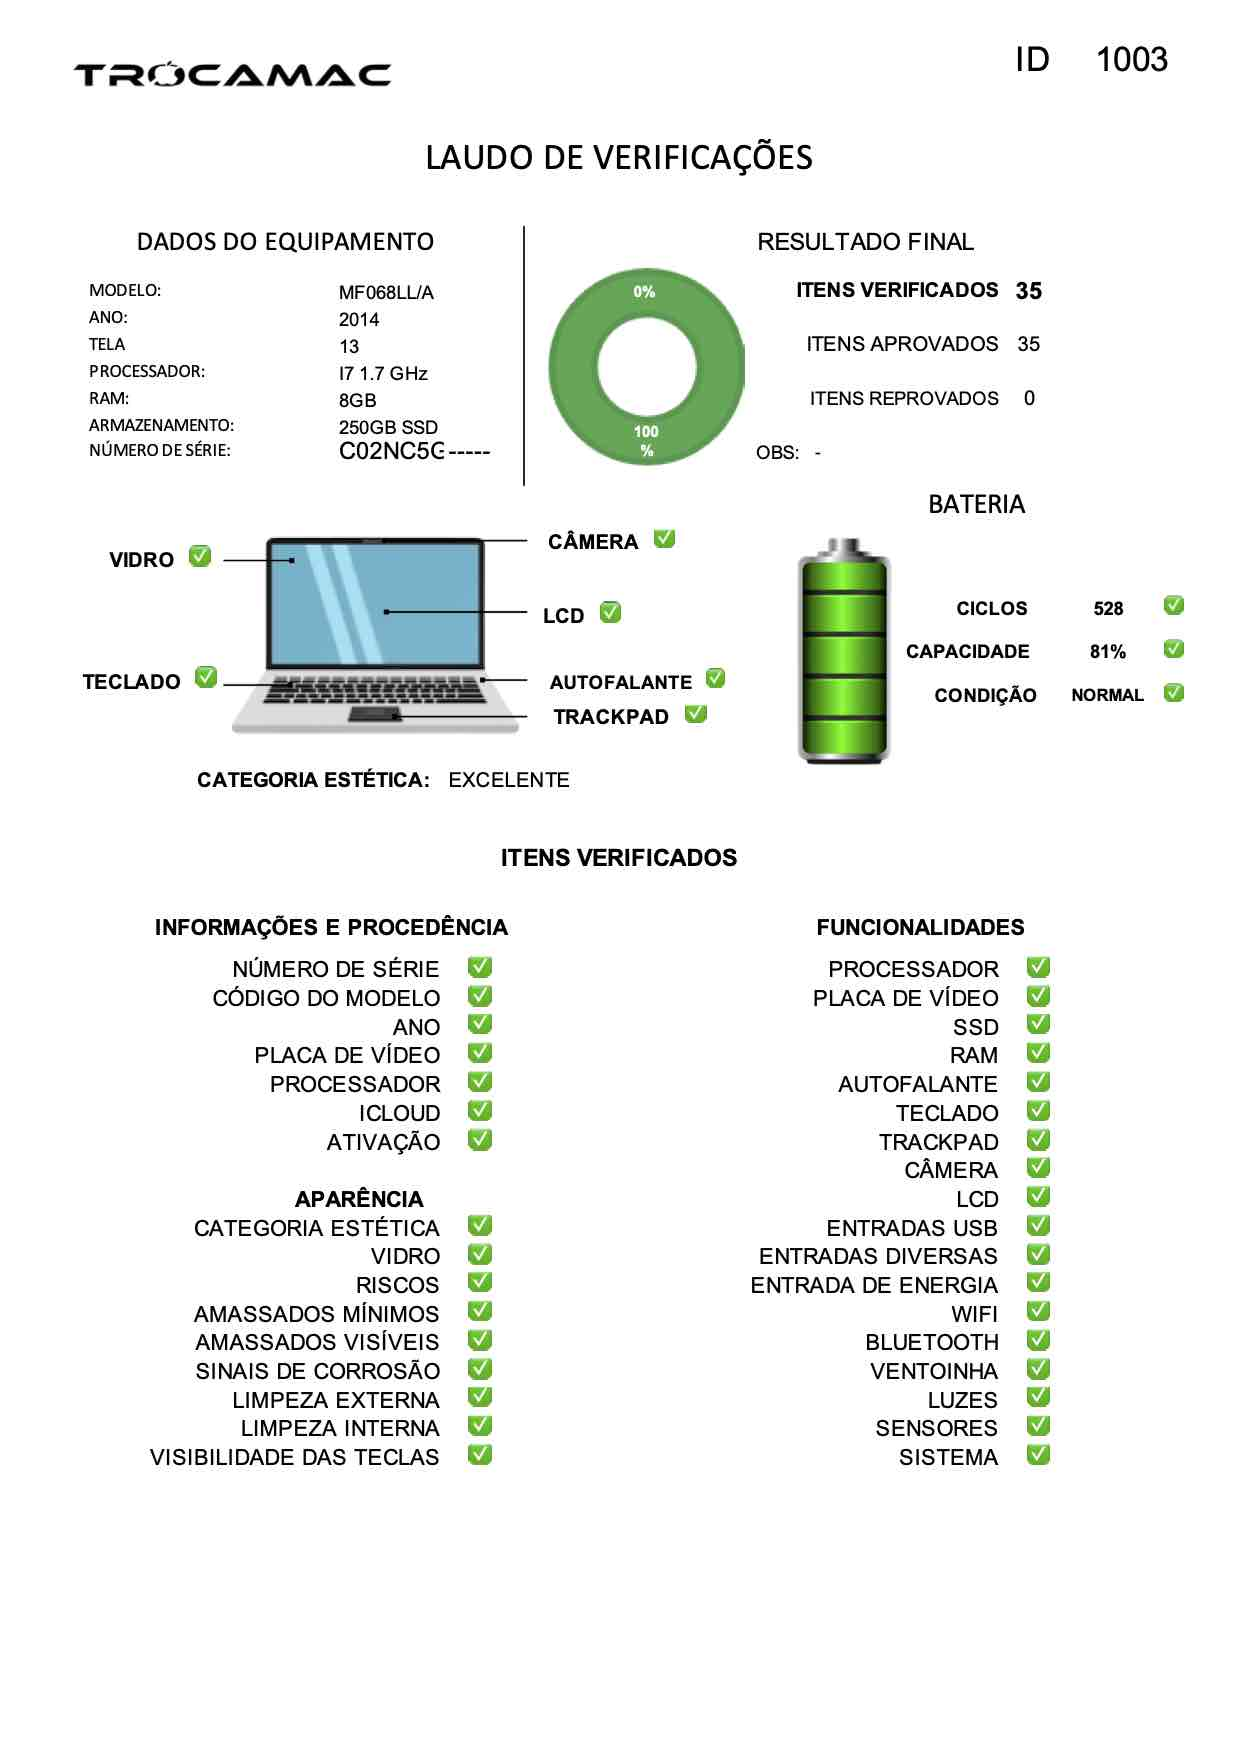 Macbook Air 13 i7 1.7Ghz 8GB 256GB SSD MF068LL/A Seminovo